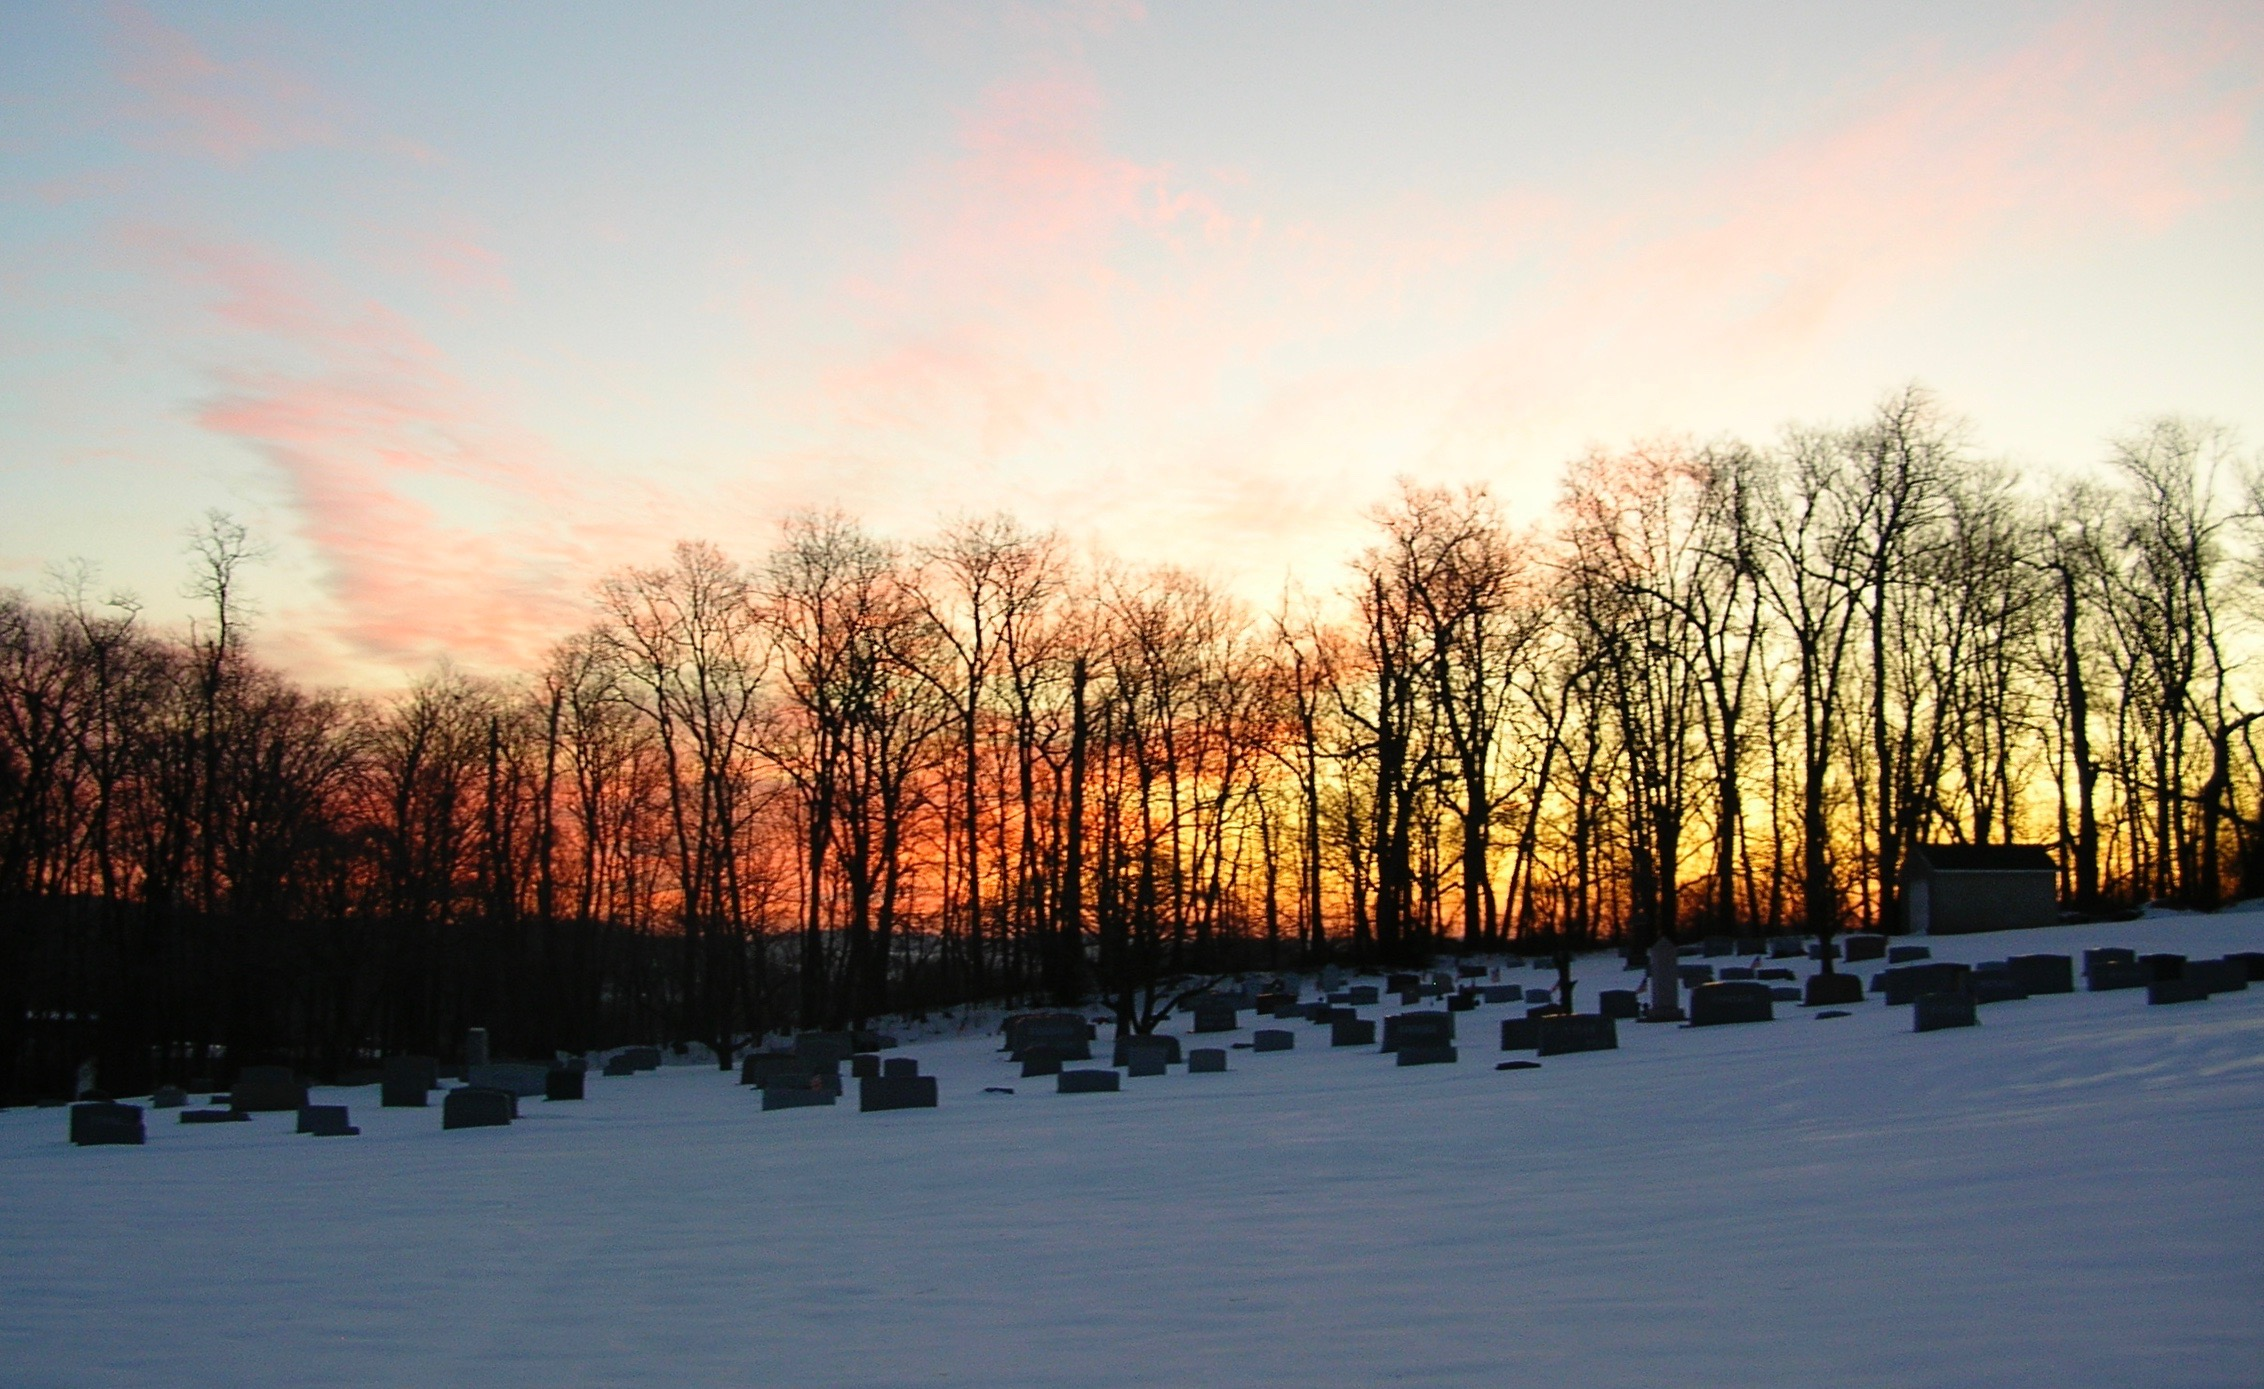 Elverson cemetery